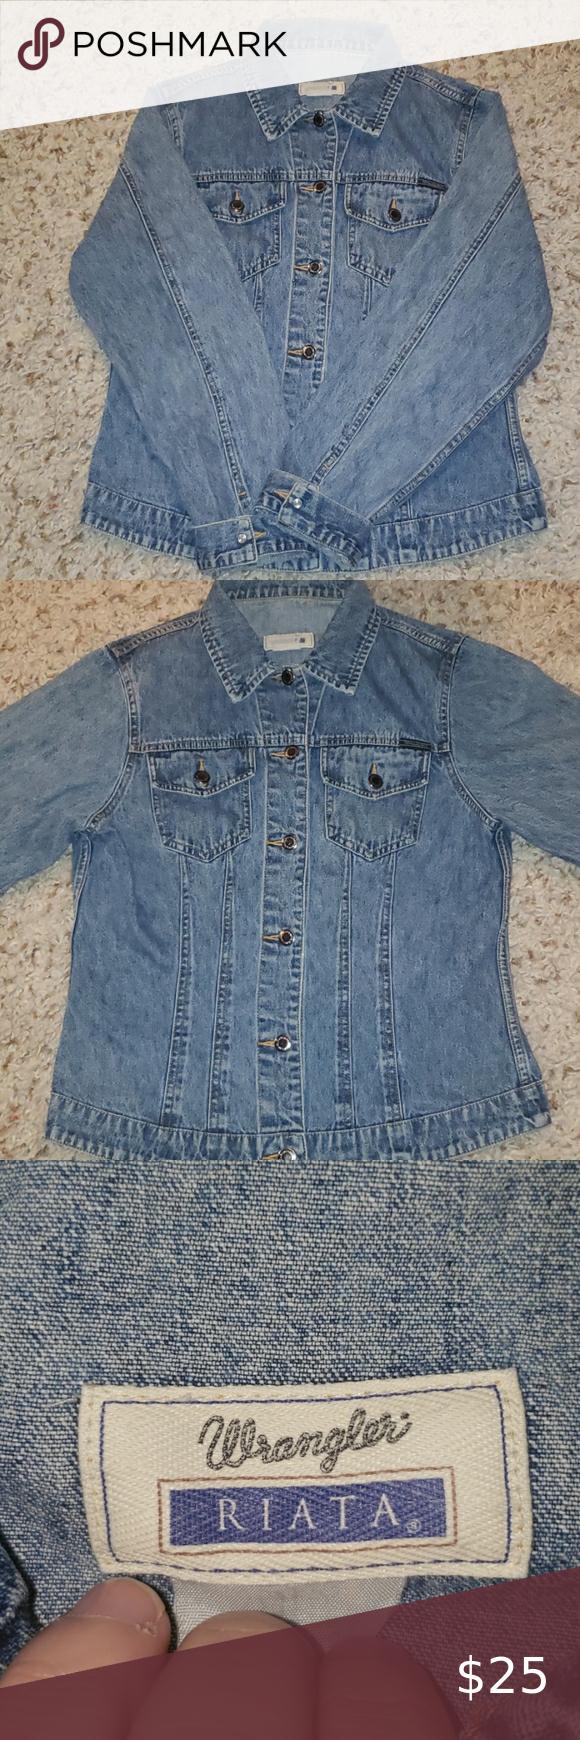 Wrangler Riata Style Denim Jean Jacket Women S S Jean Jacket Women Denim Fashion Jackets For Women [ 1740 x 580 Pixel ]